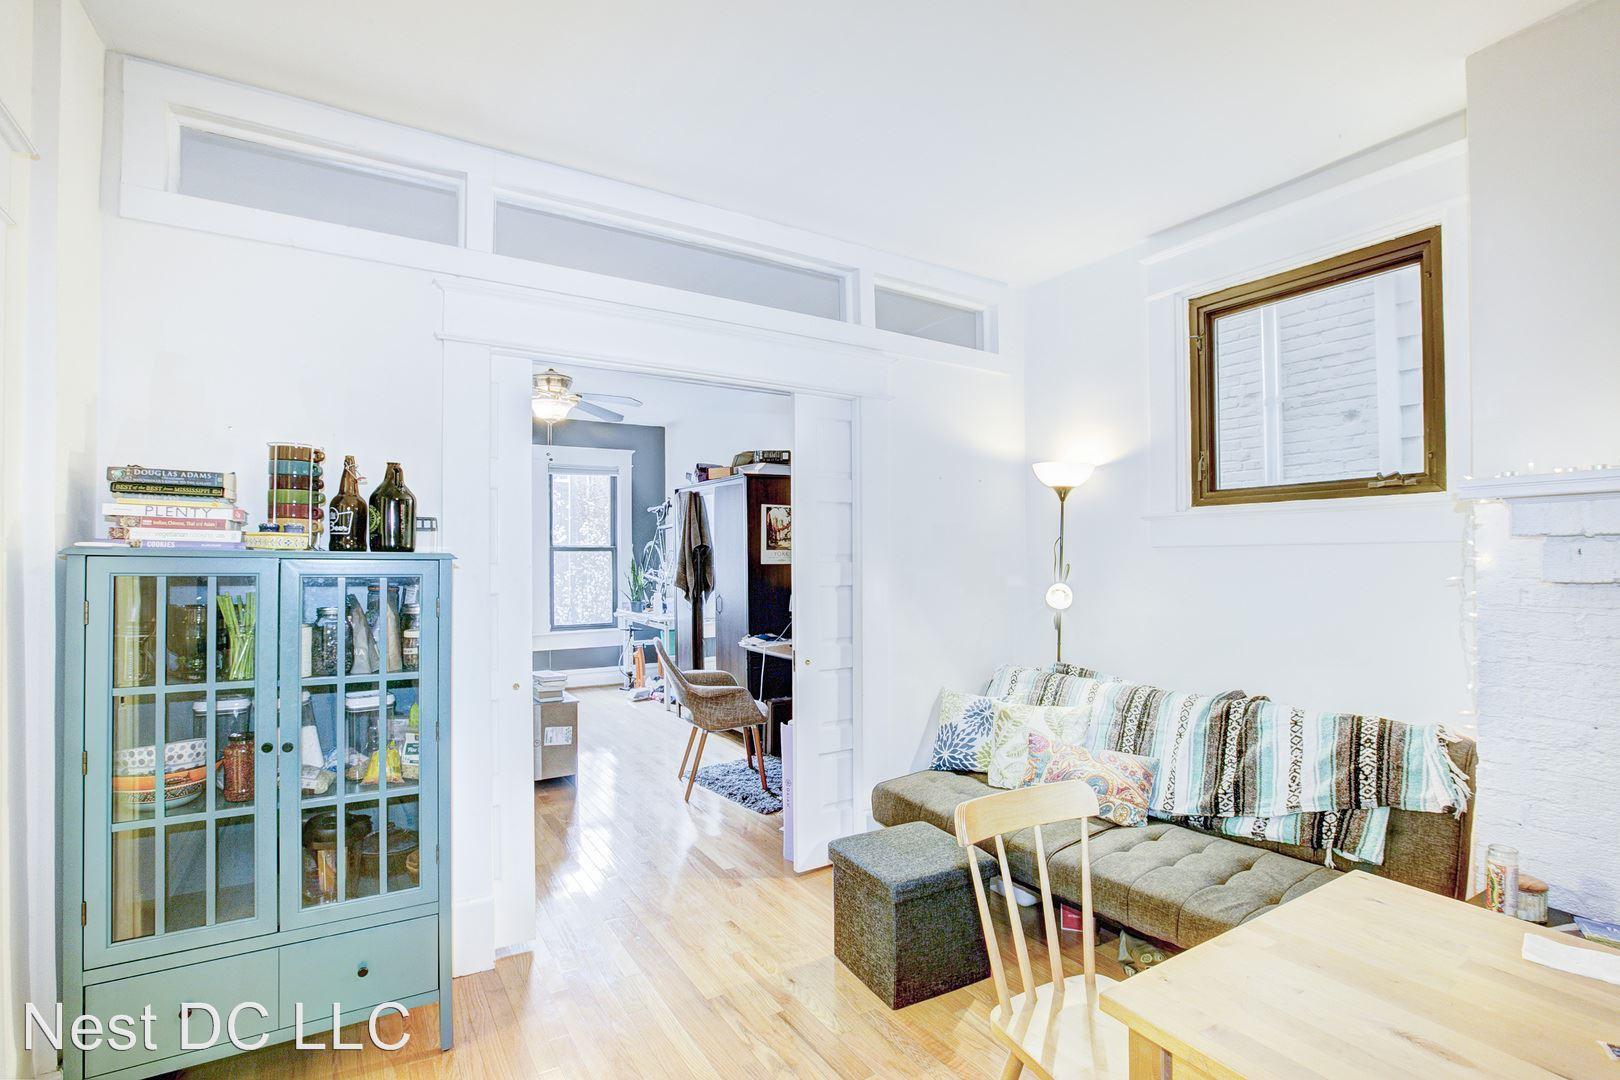 1215 10th St NW #21 For Rent - Washington, DC | Trulia